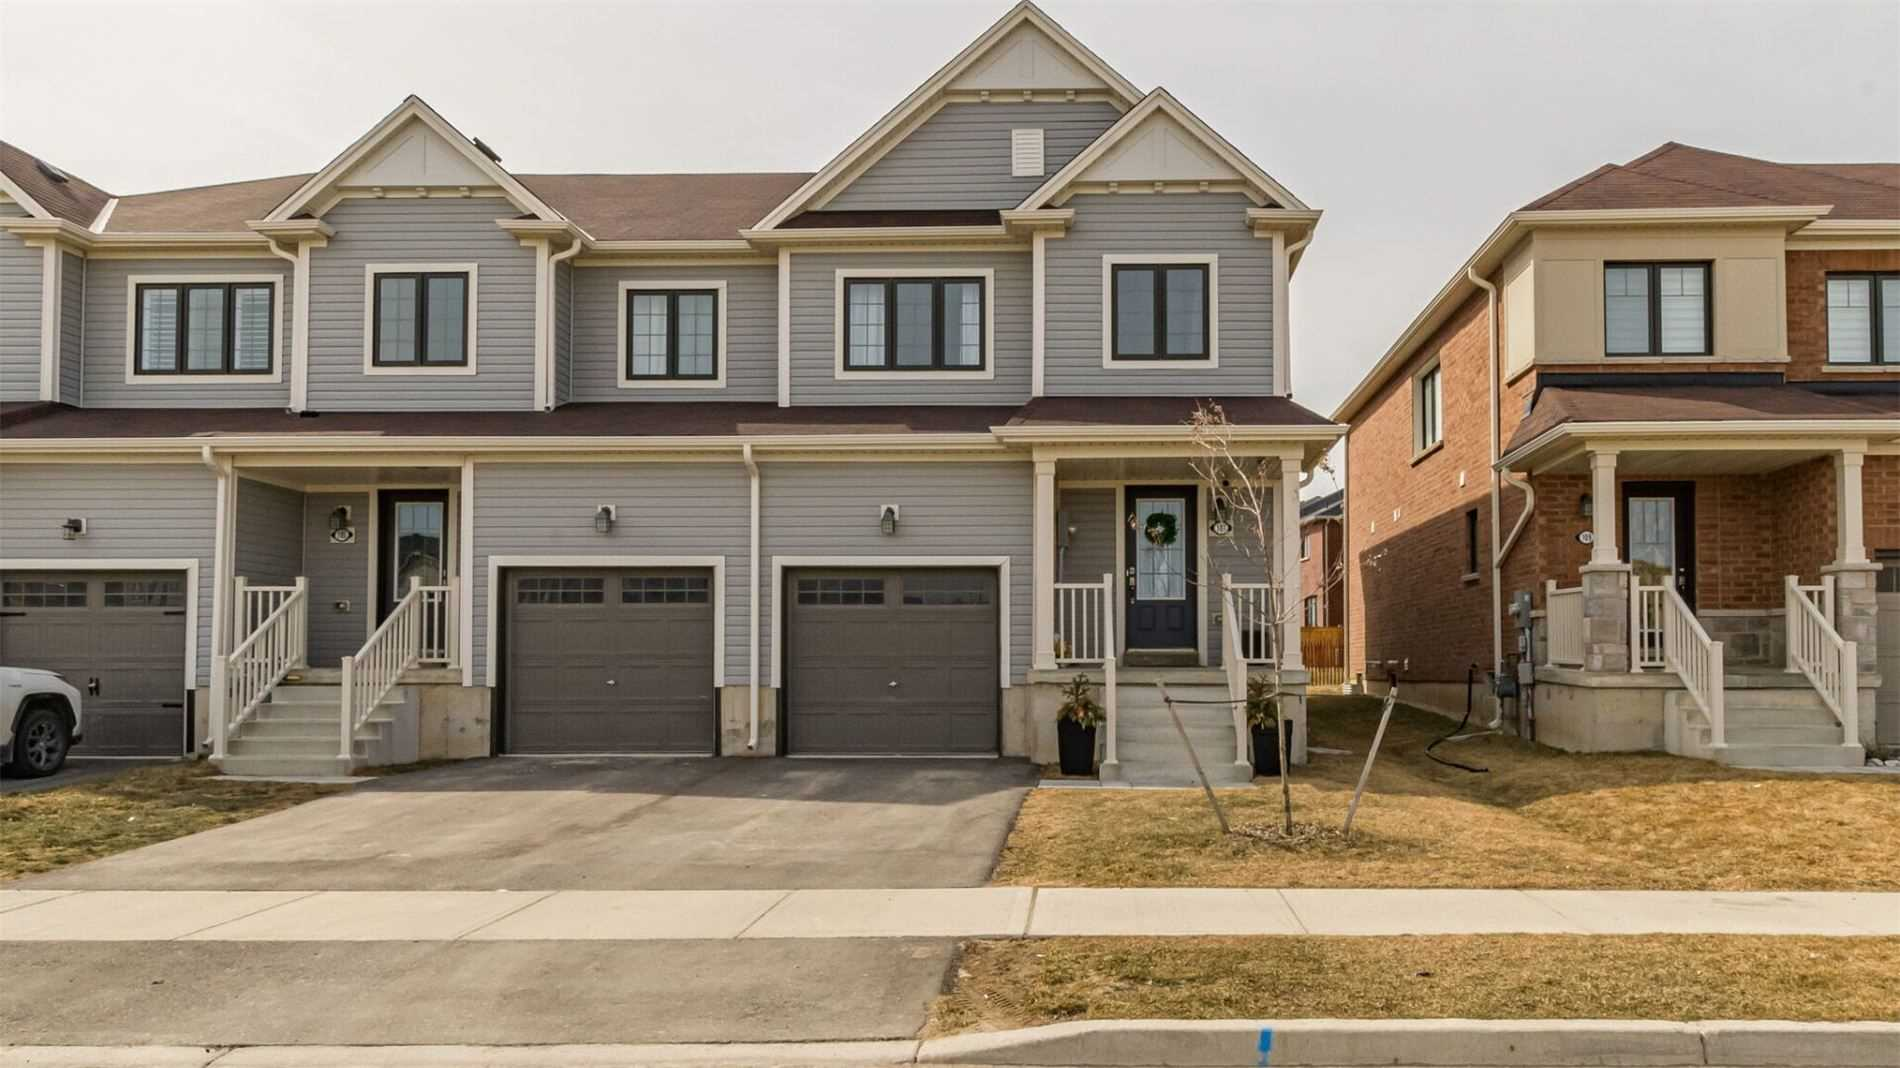 107 Thompson Rd, Haldimand, Ontario N3W0B8, 3 Bedrooms Bedrooms, ,3 BathroomsBathrooms,Att/row/twnhouse,For Sale,Thompson,X5170334